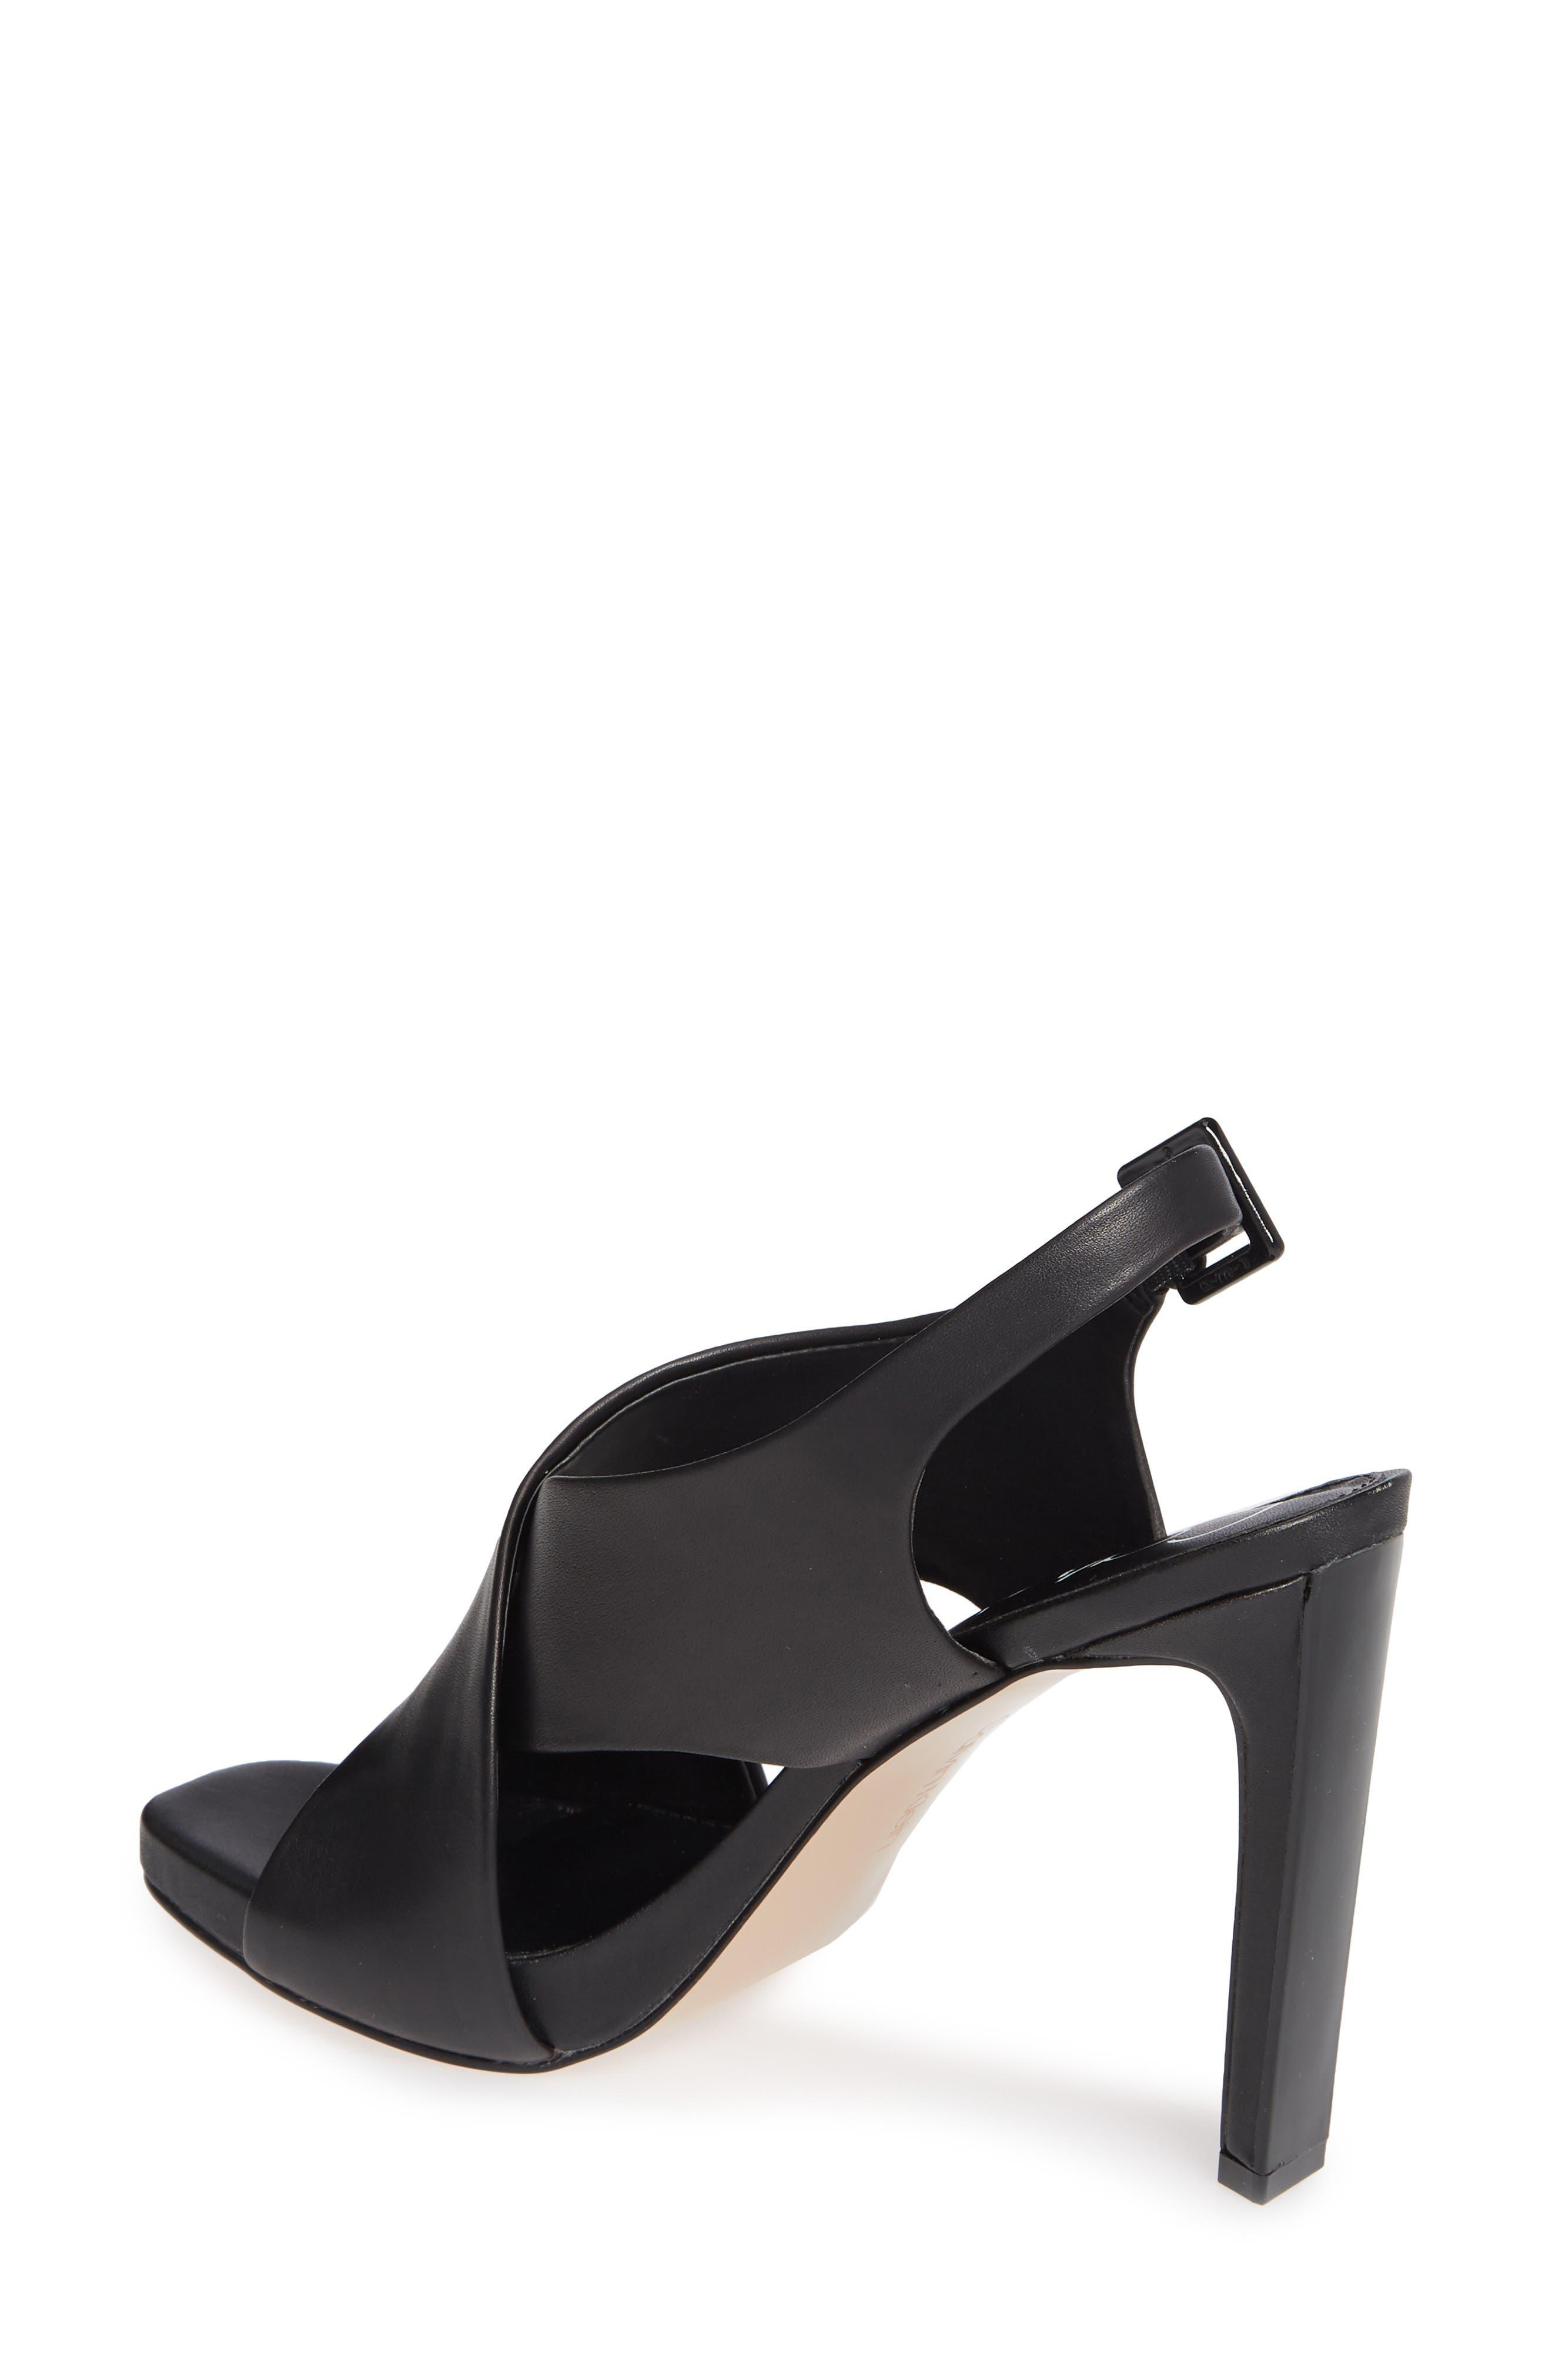 Myra Cross Strap Sandal,                             Alternate thumbnail 2, color,                             BLACK LEATHER